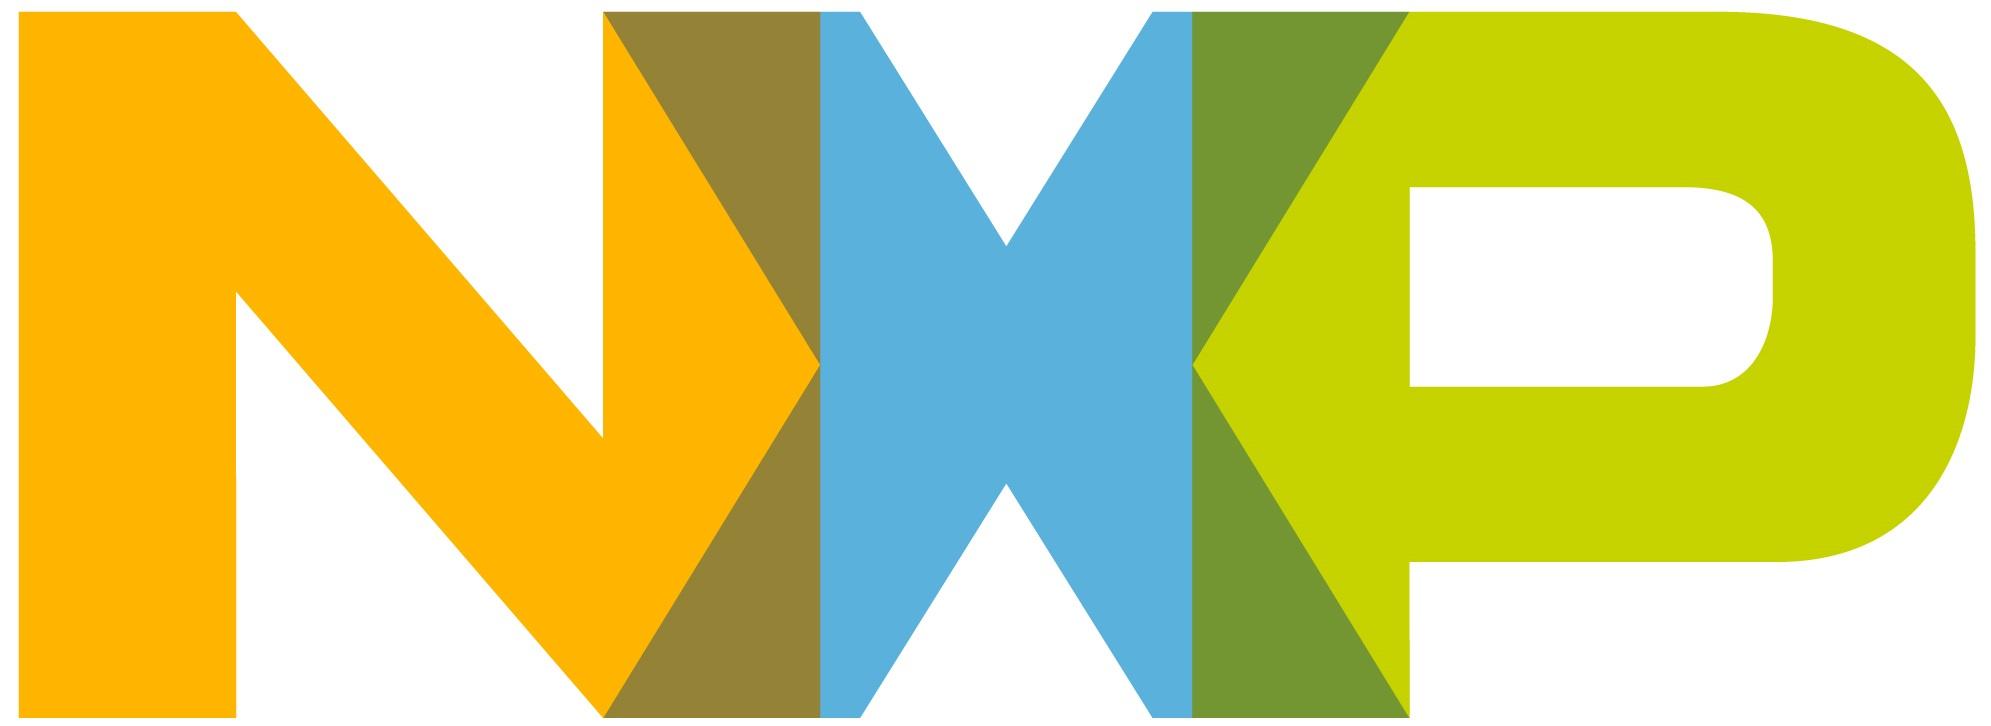 RoboCup Sponsor - NXP